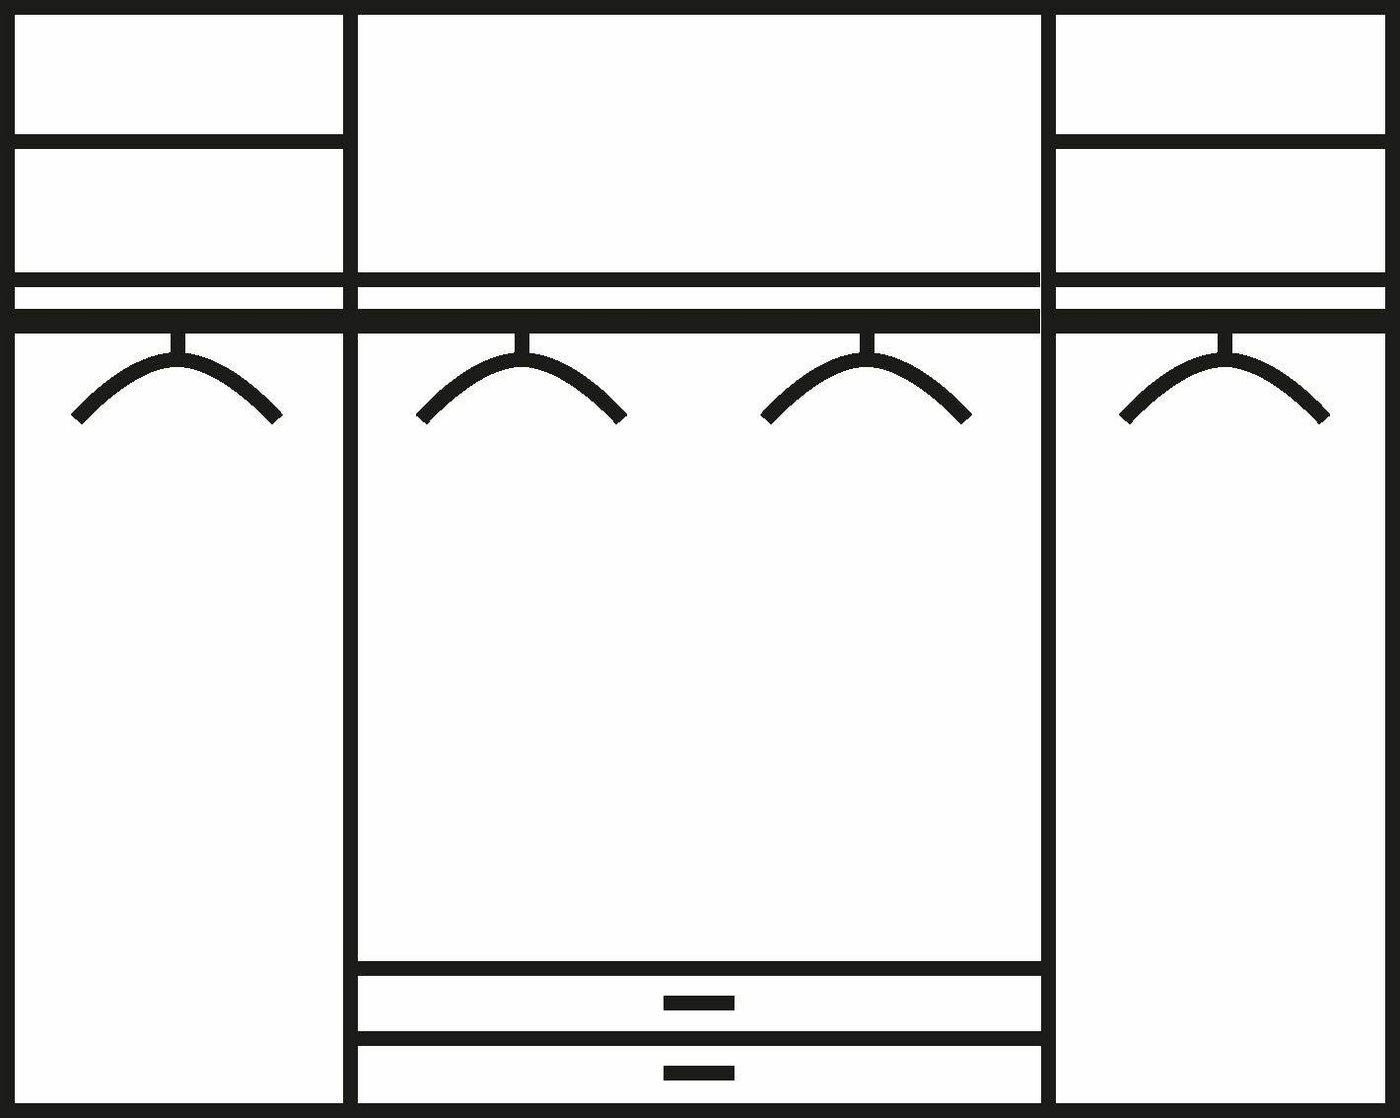 staubsauger schrank inspirierendes design. Black Bedroom Furniture Sets. Home Design Ideas